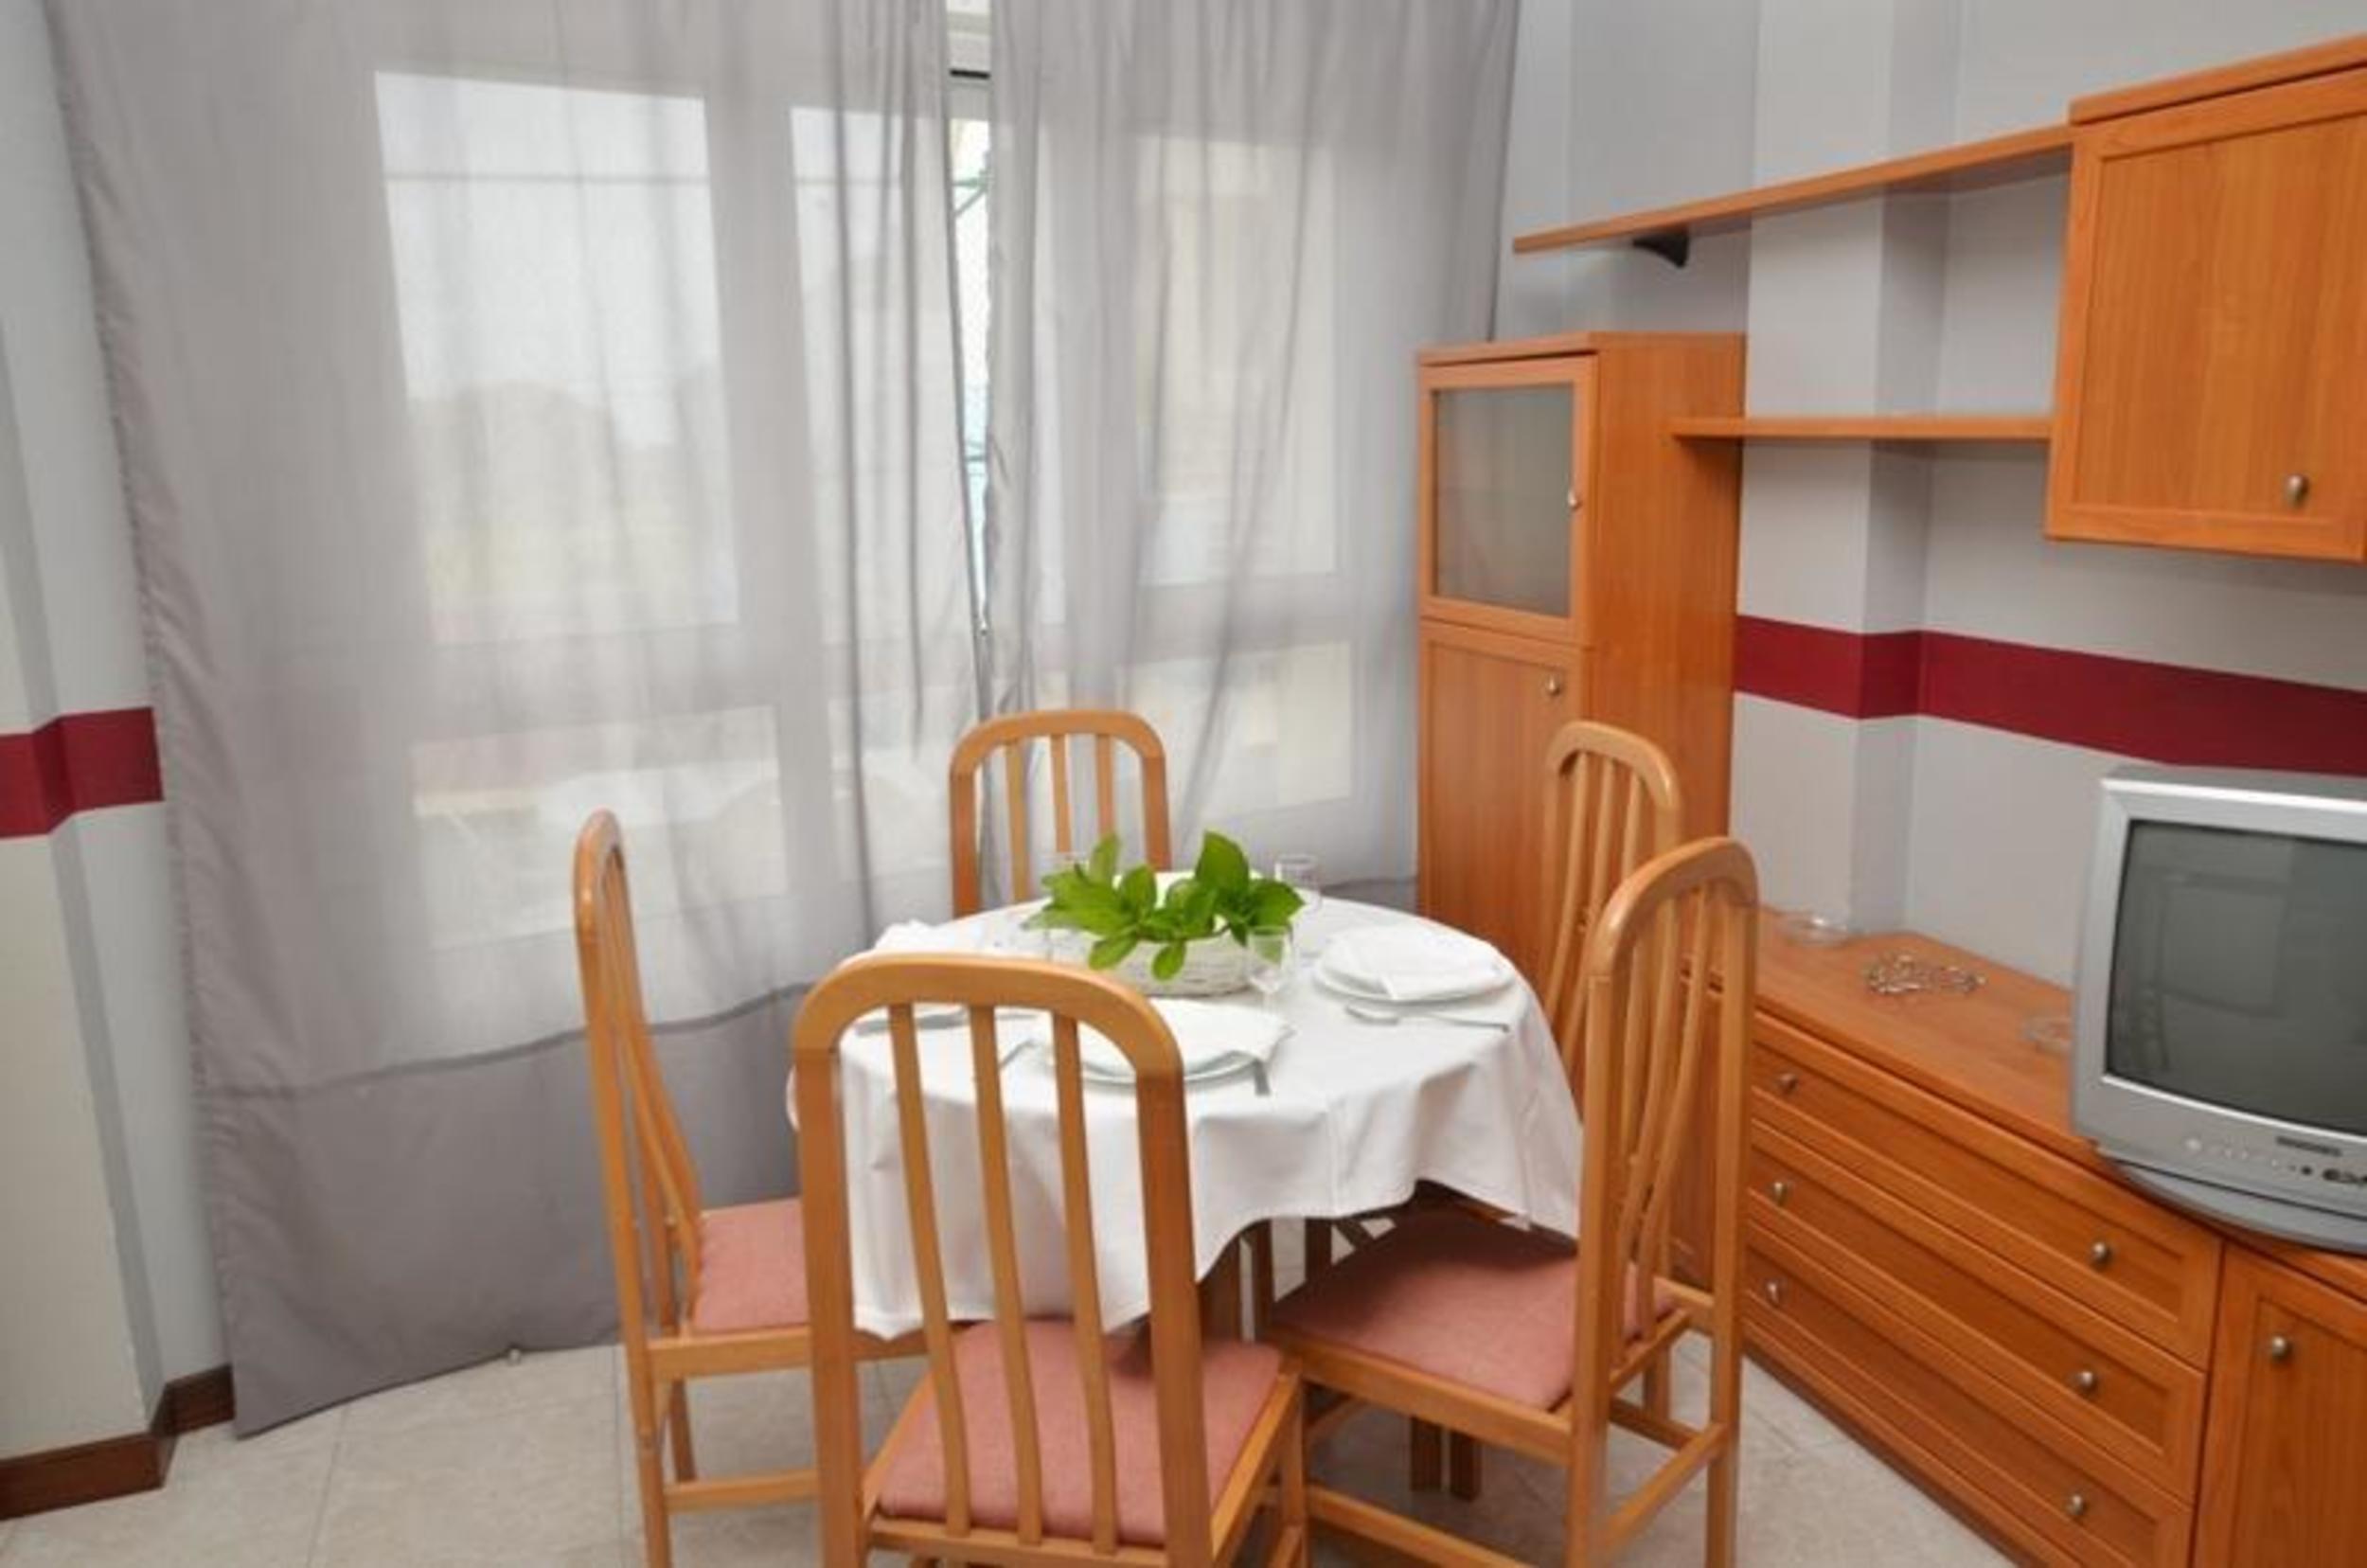 Ferienwohnung Apartment - 2 Bedrooms with Pool and Sea views - 102766 (2360874), Isla, Costa de Cantabria, Kantabrien, Spanien, Bild 2